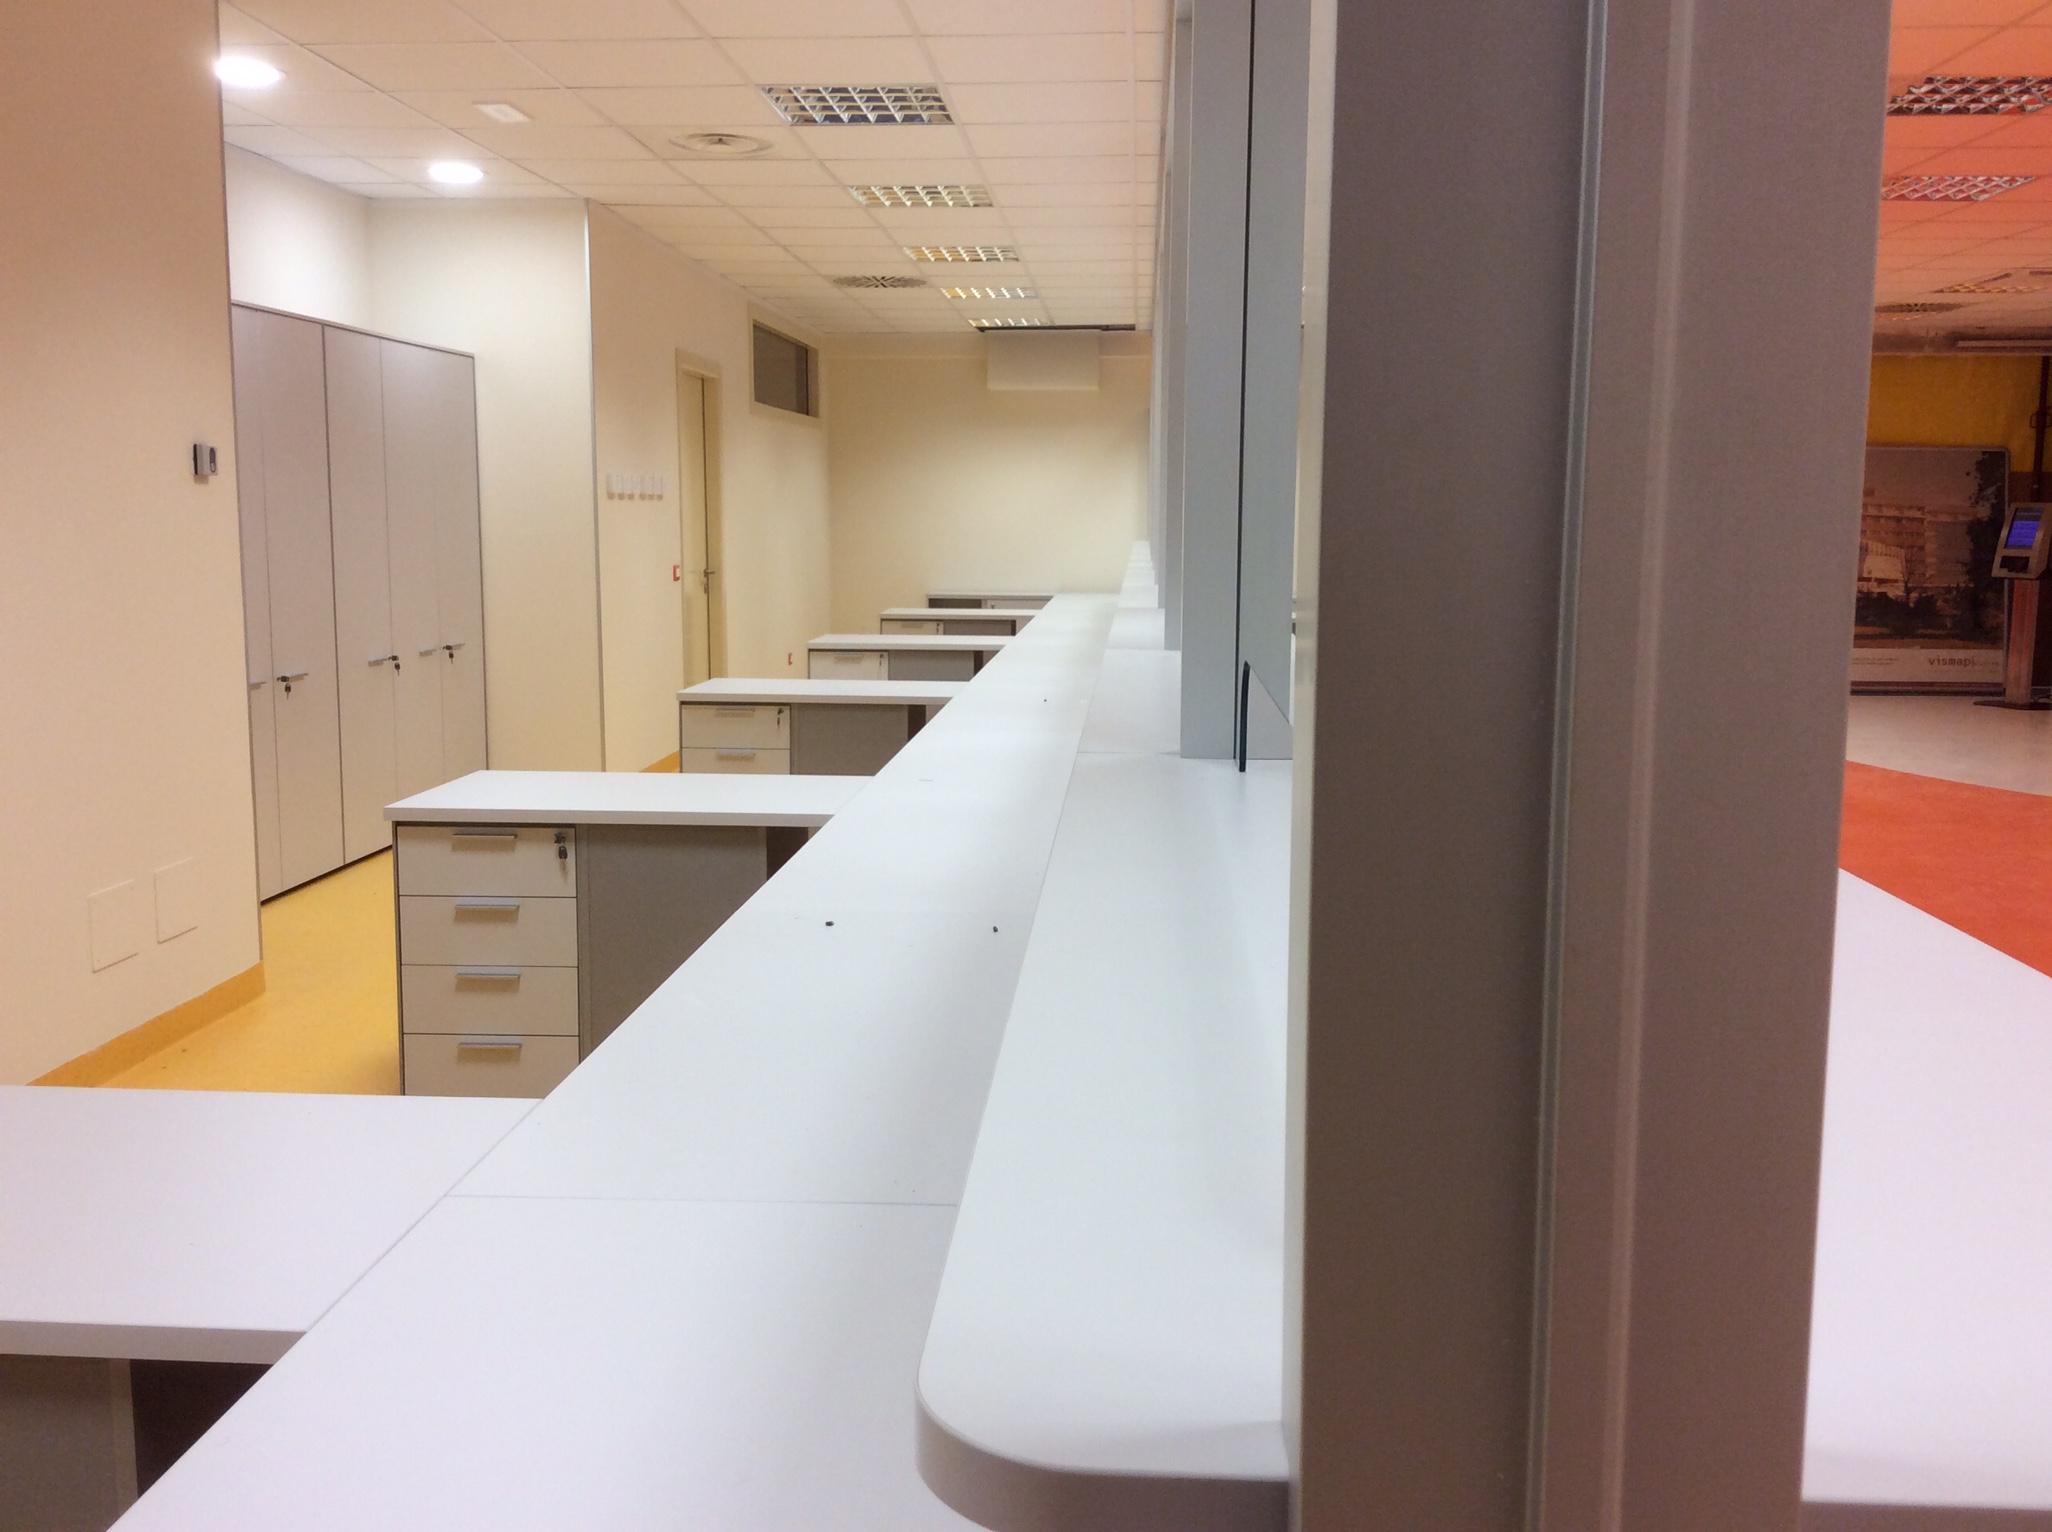 19 Arredamento uffici ospedale multipostazione - Riganelli Arredamenti